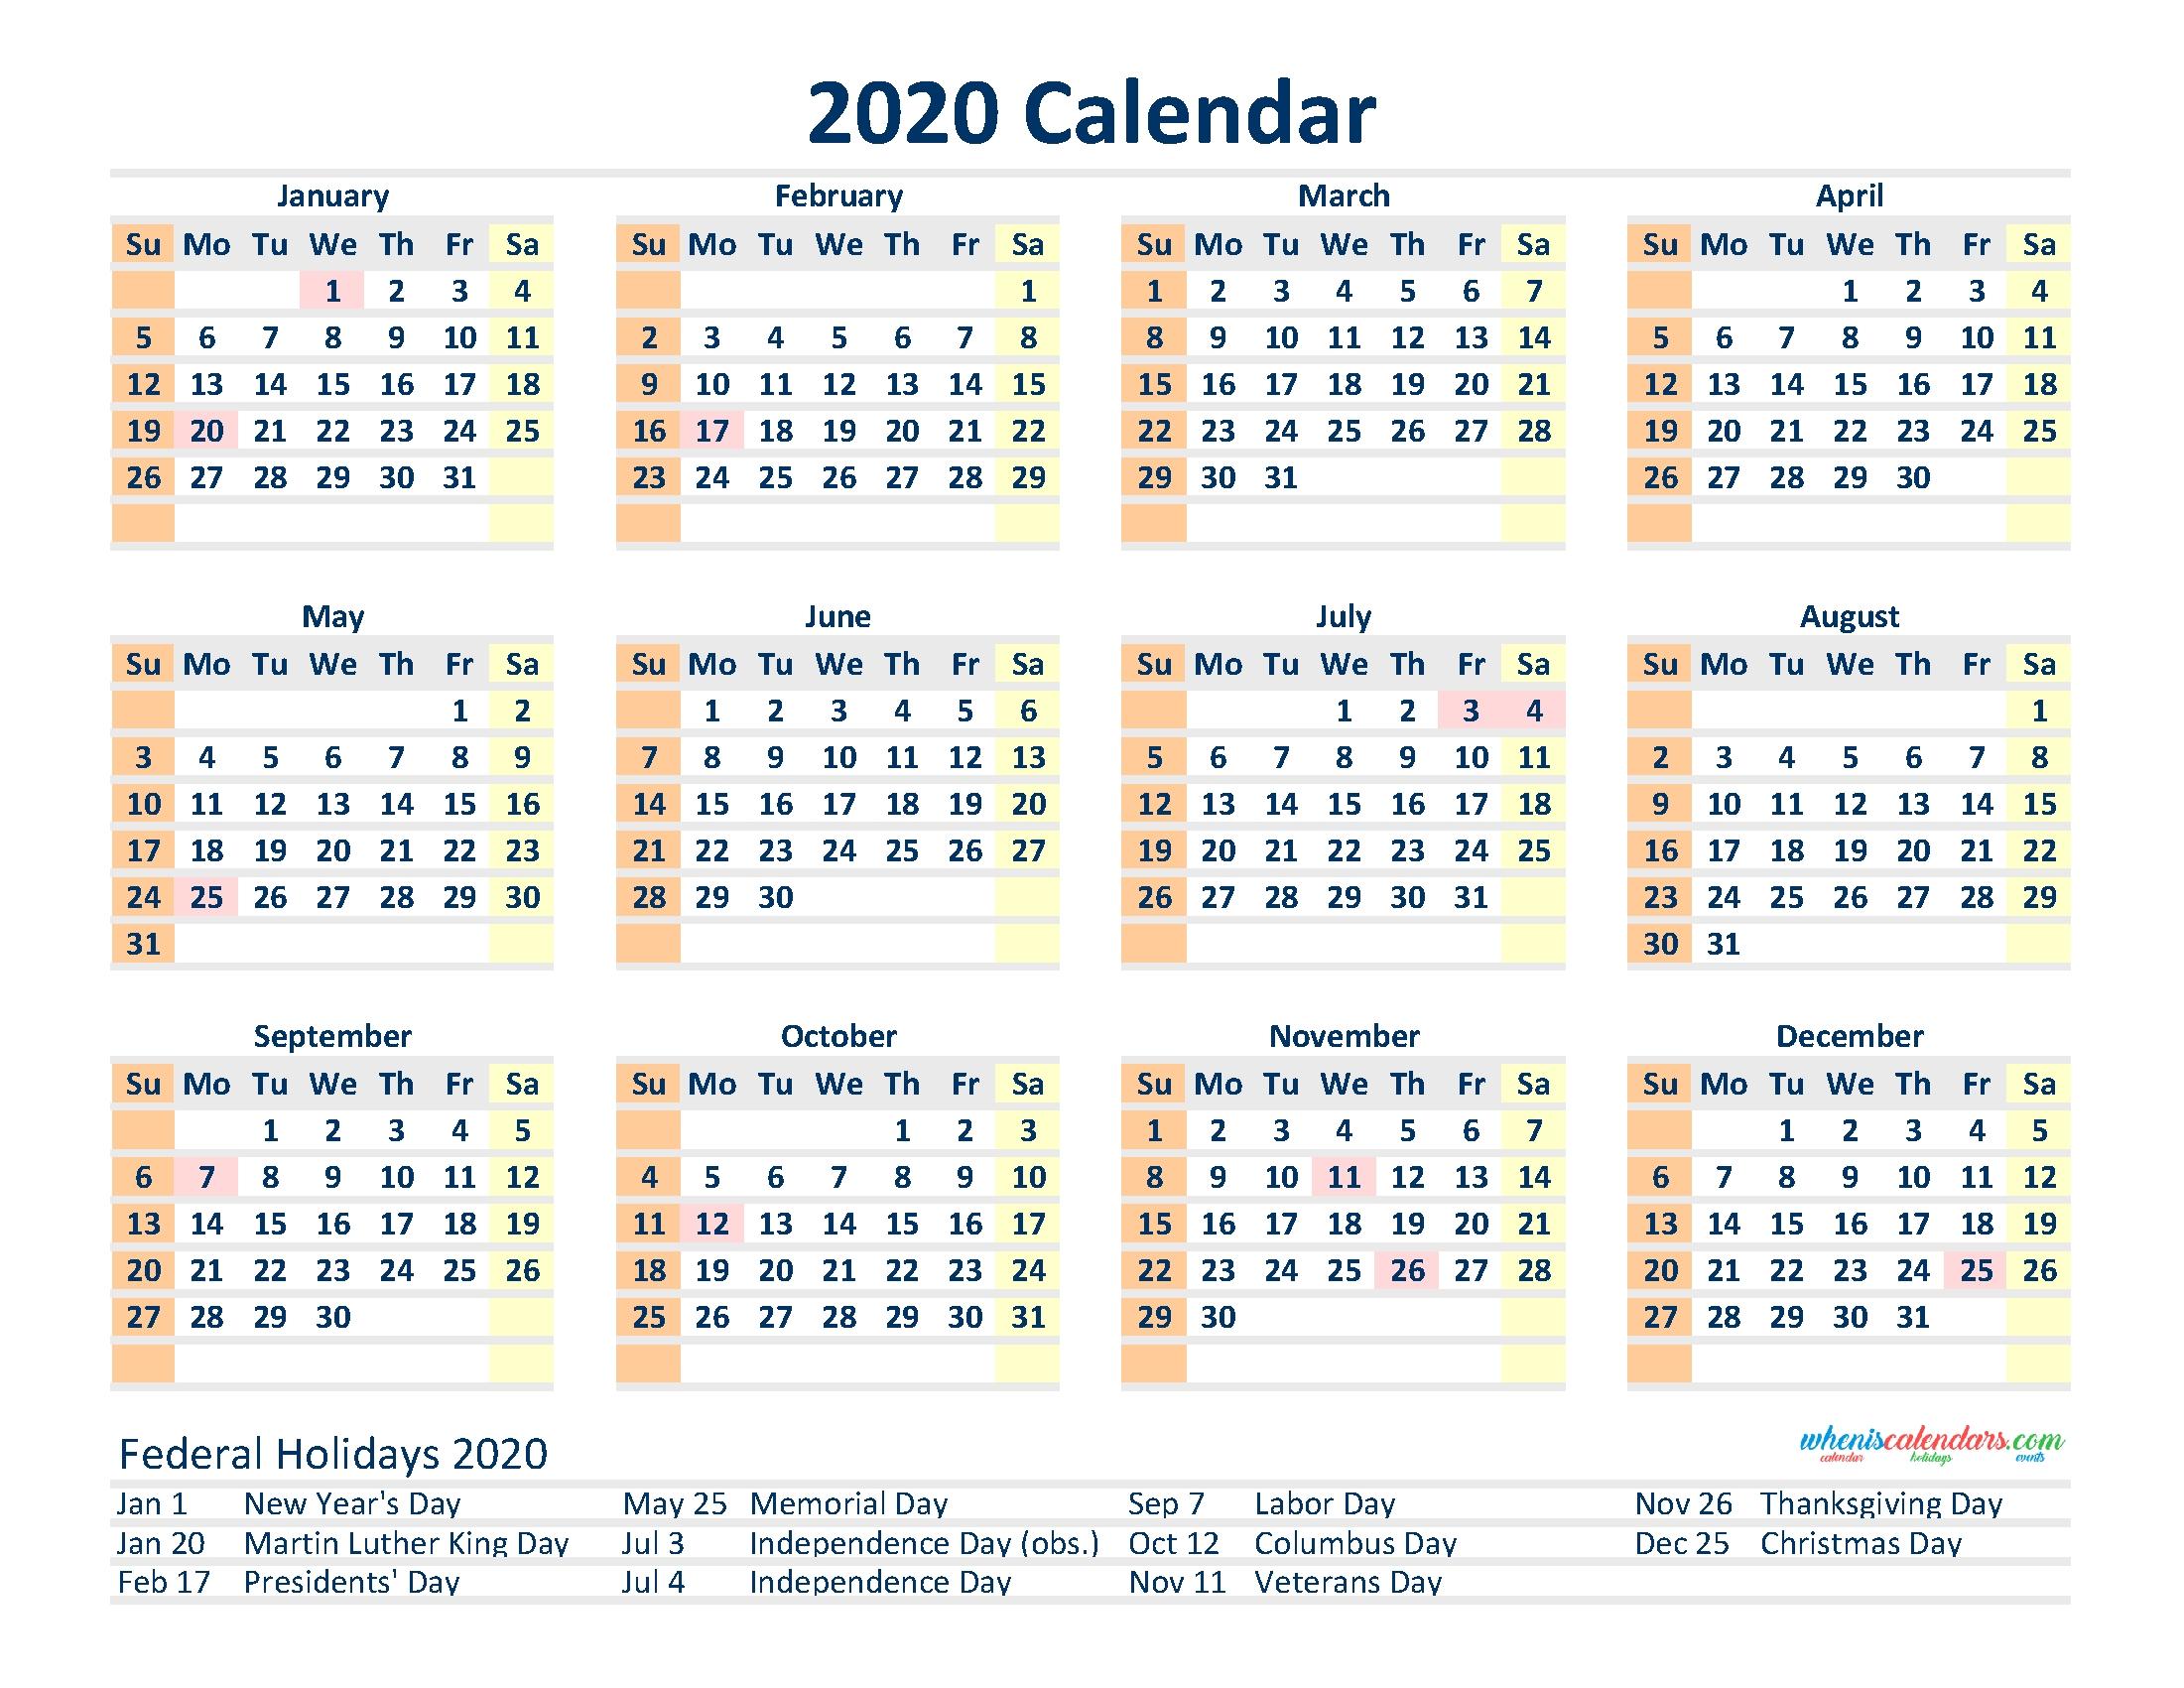 Free 2020 12 Month Calendar Printable Pdf, Excel, Image inside 2020 12 Month Calendar Printable